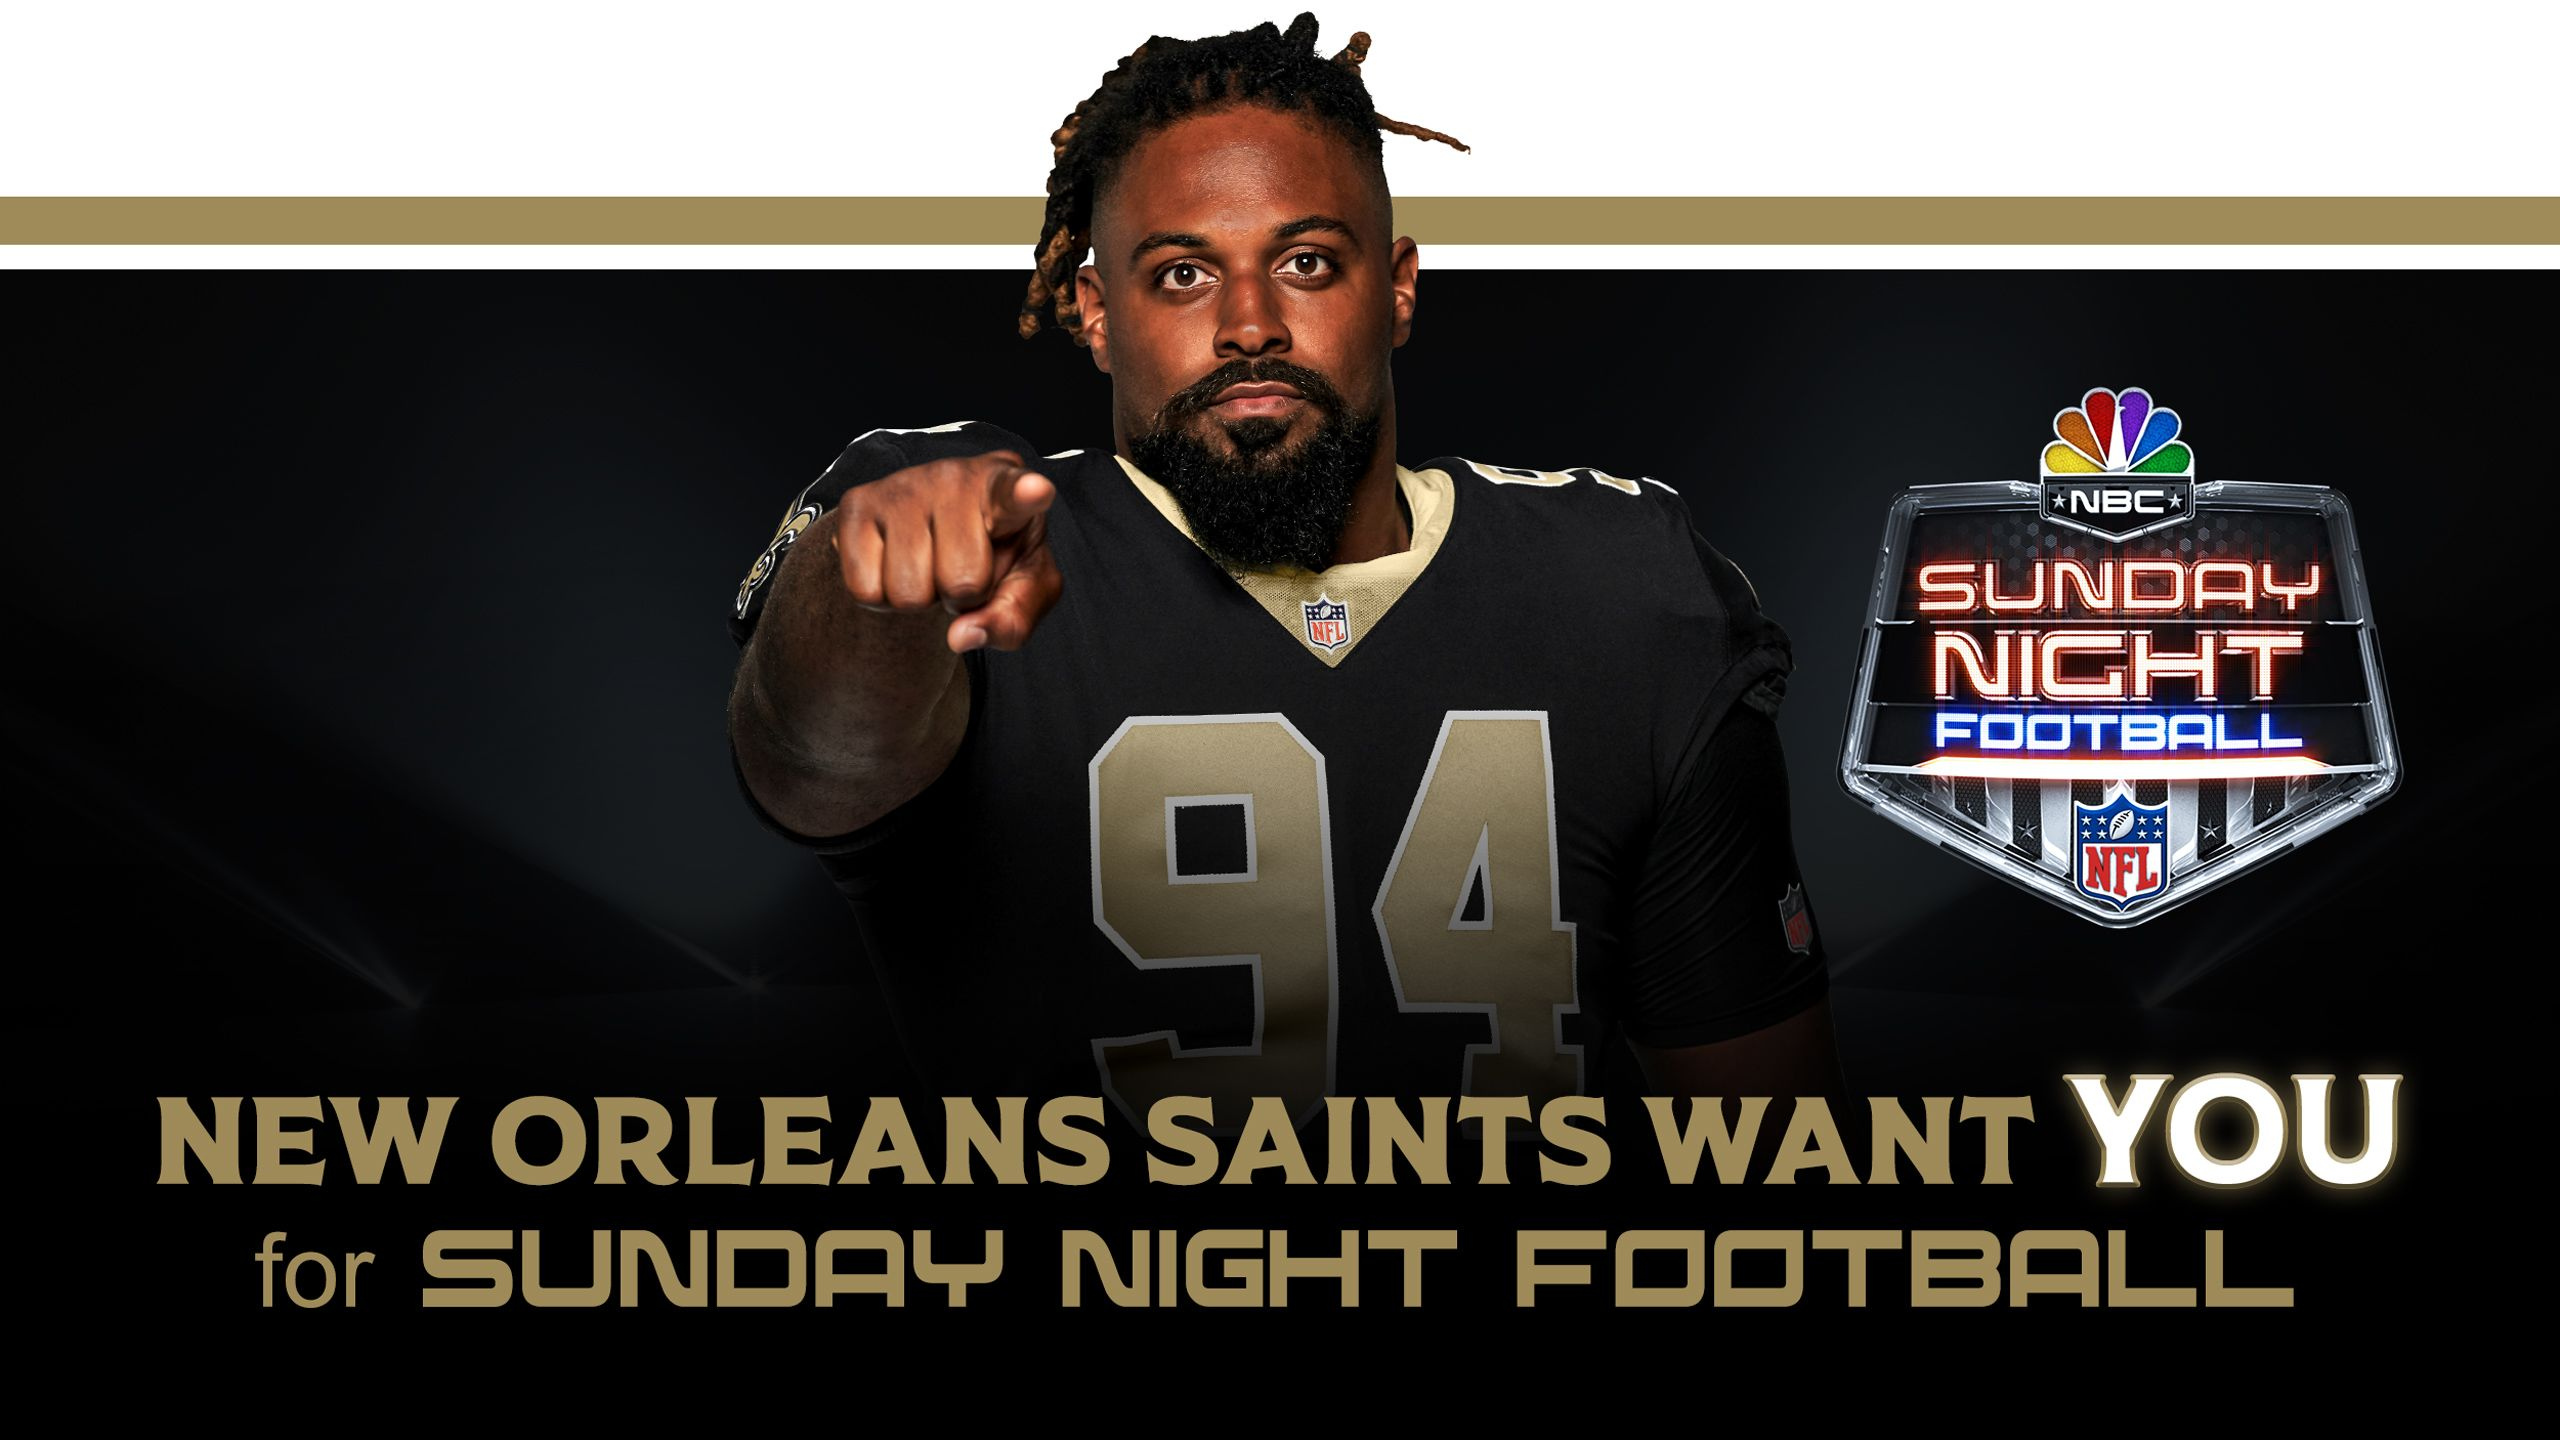 BE PART OF NBC's SUNDAY NIGHT FOOTBALL